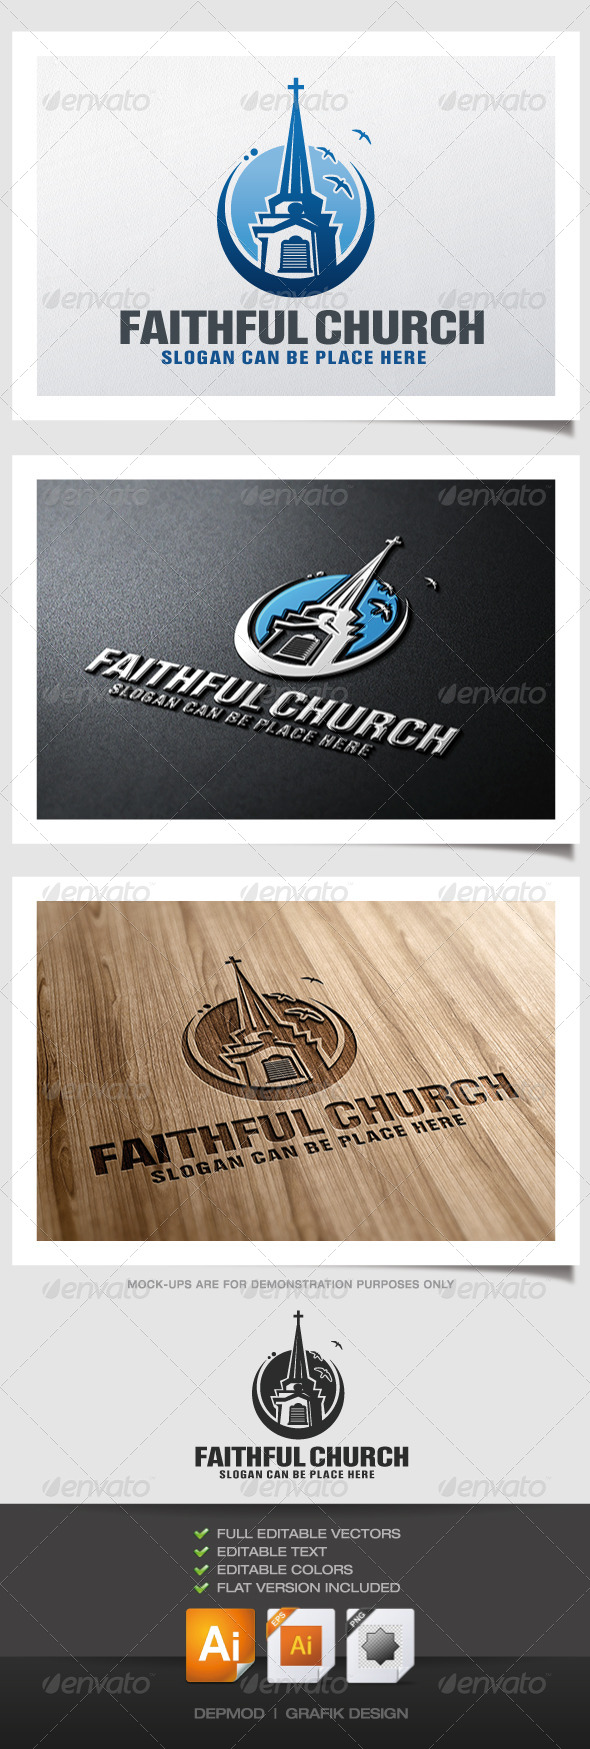 GraphicRiver Faithful Church Logo 4587225